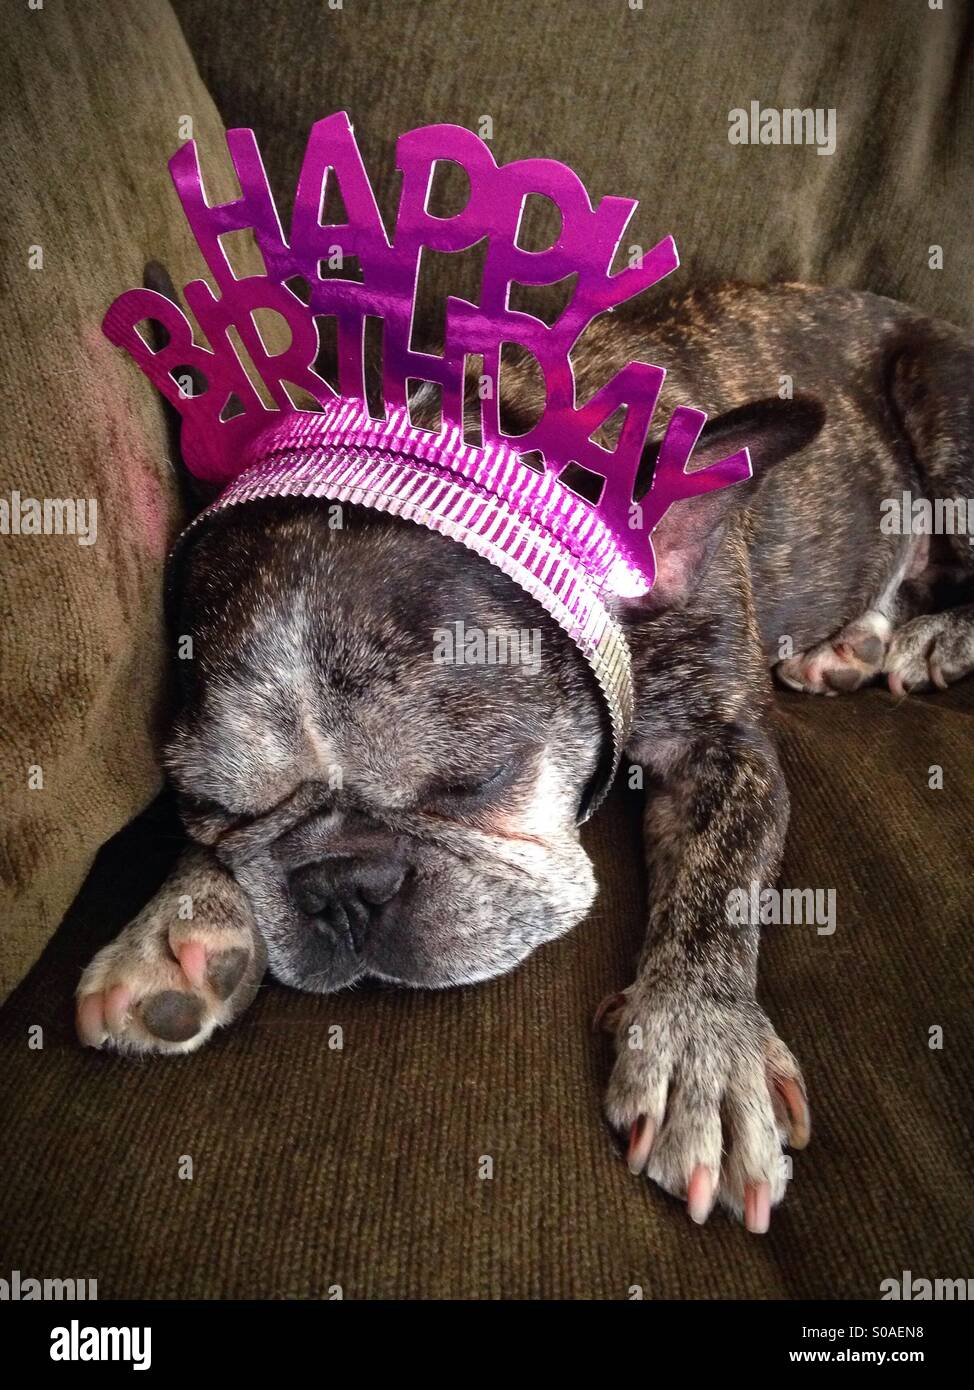 A sleeping french bulldog wearing a happy birthday tiara